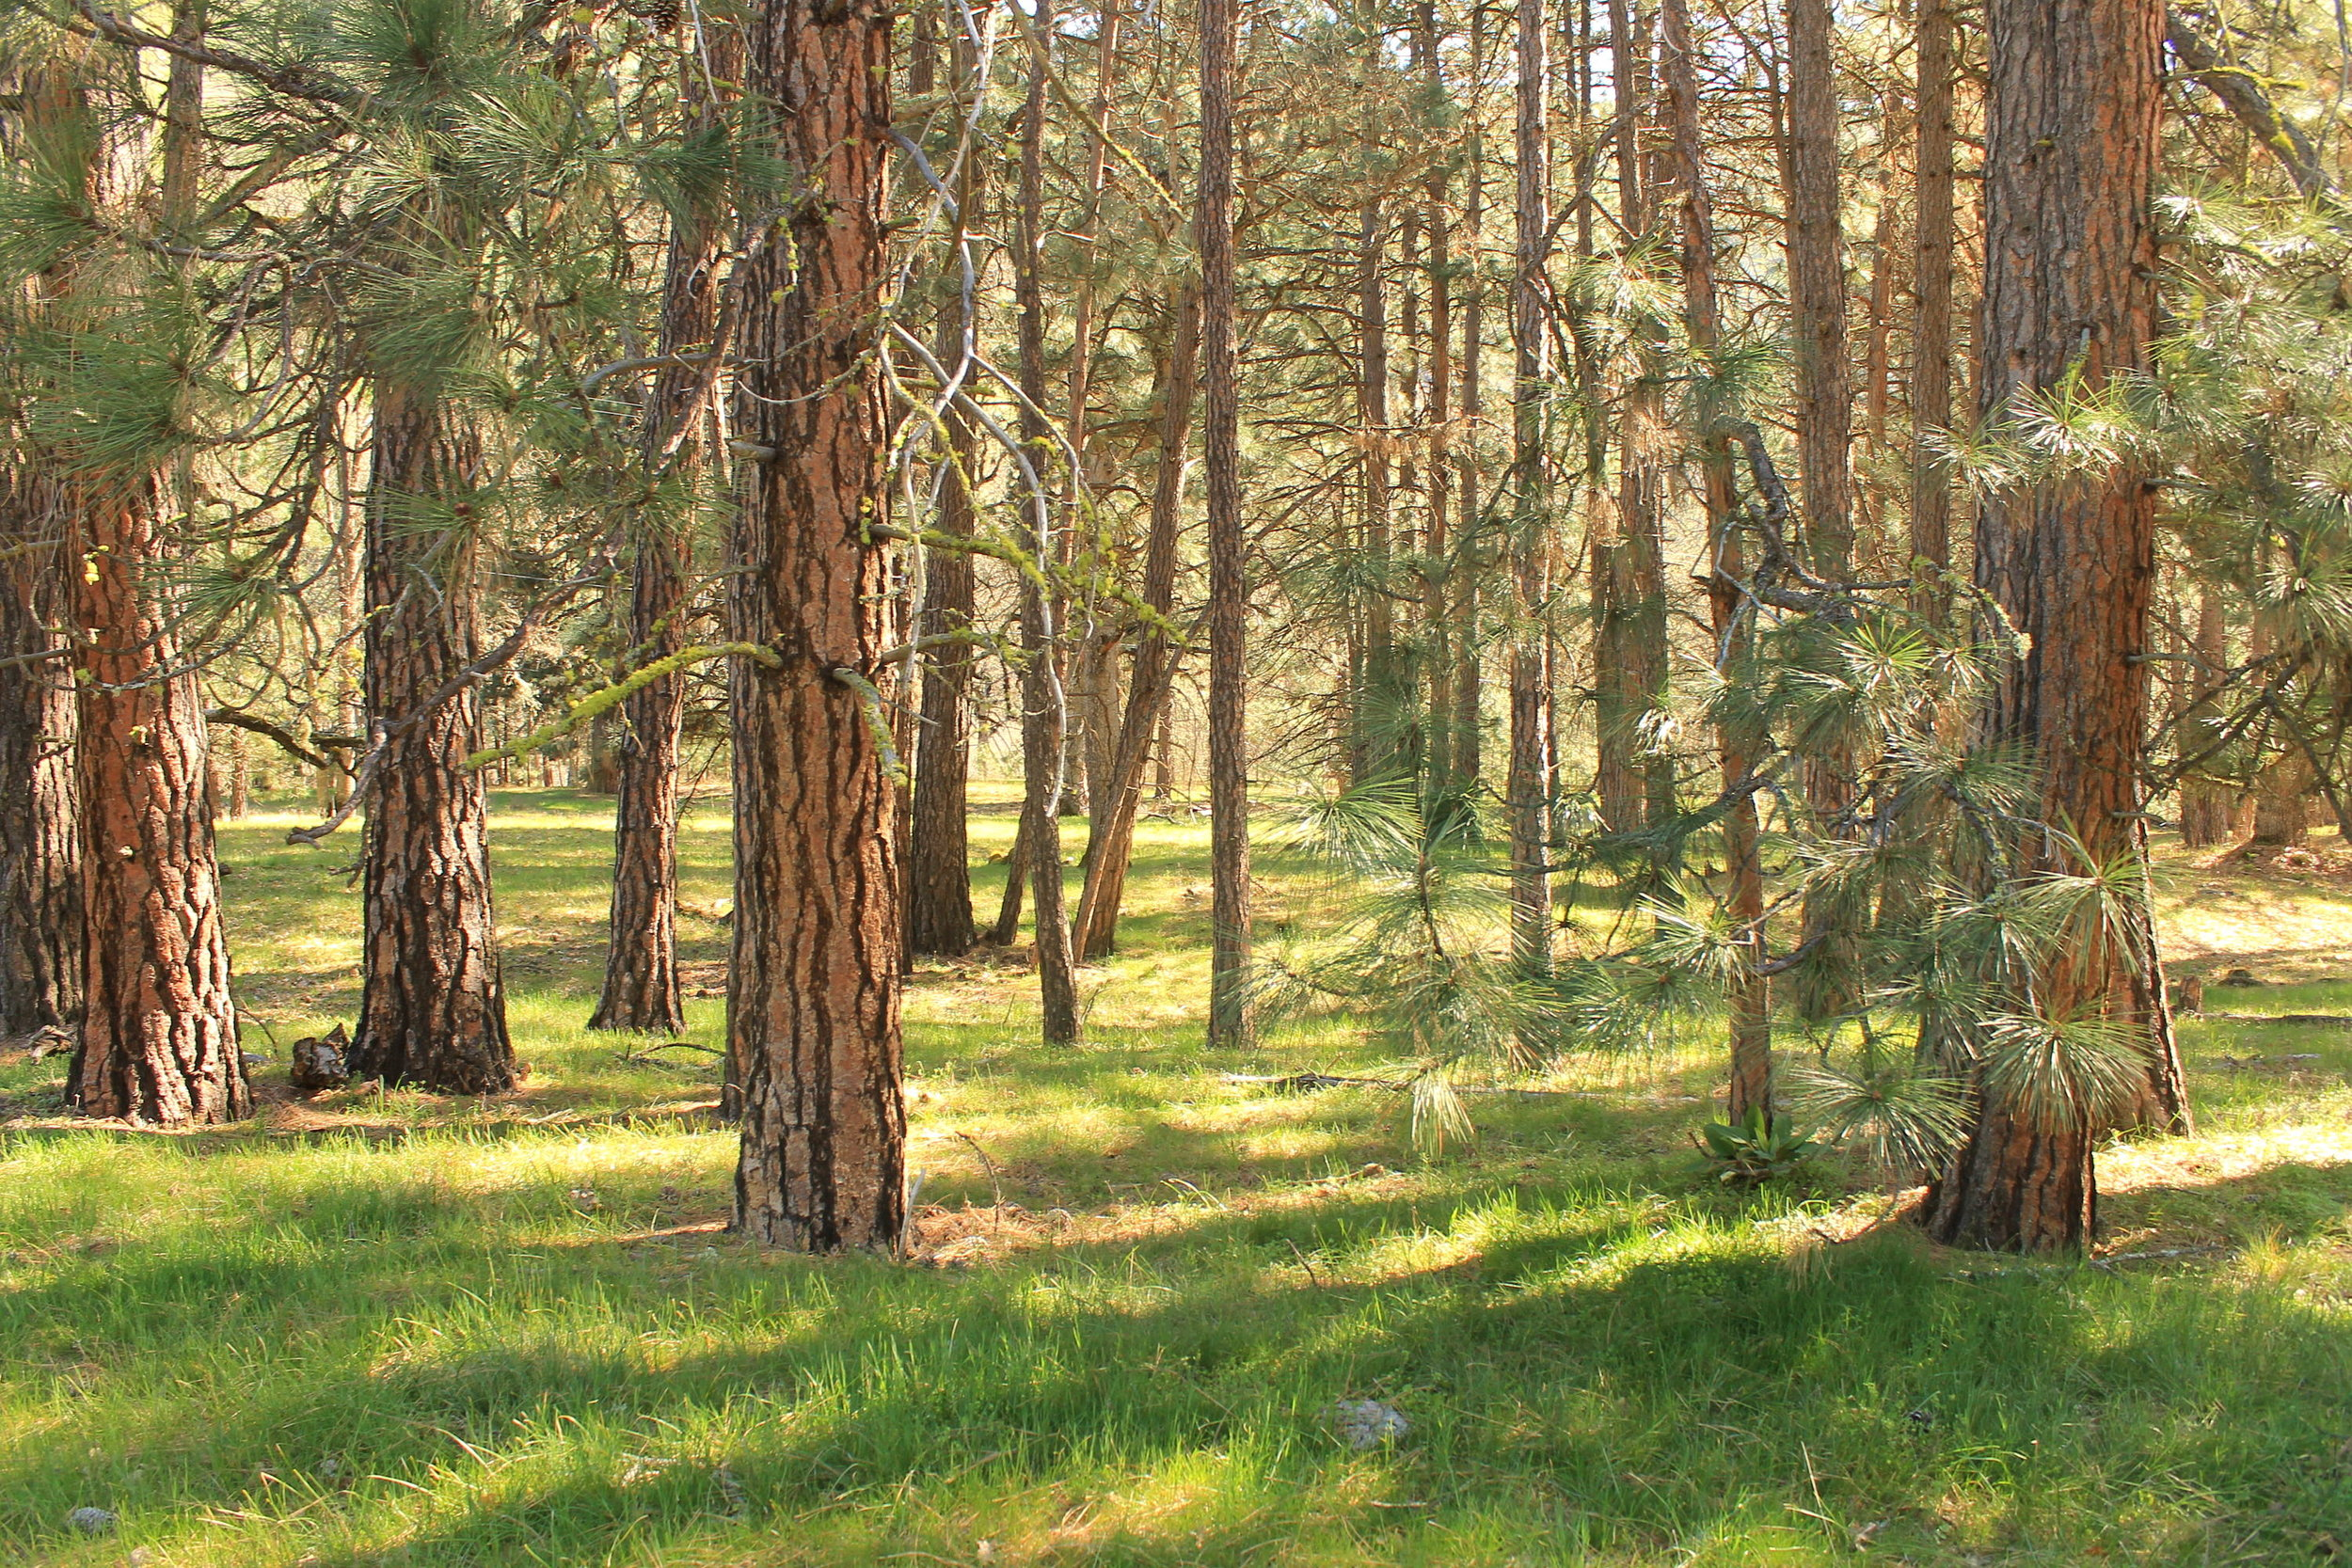 Grove of Ponderosa pines along the Klickitat River.